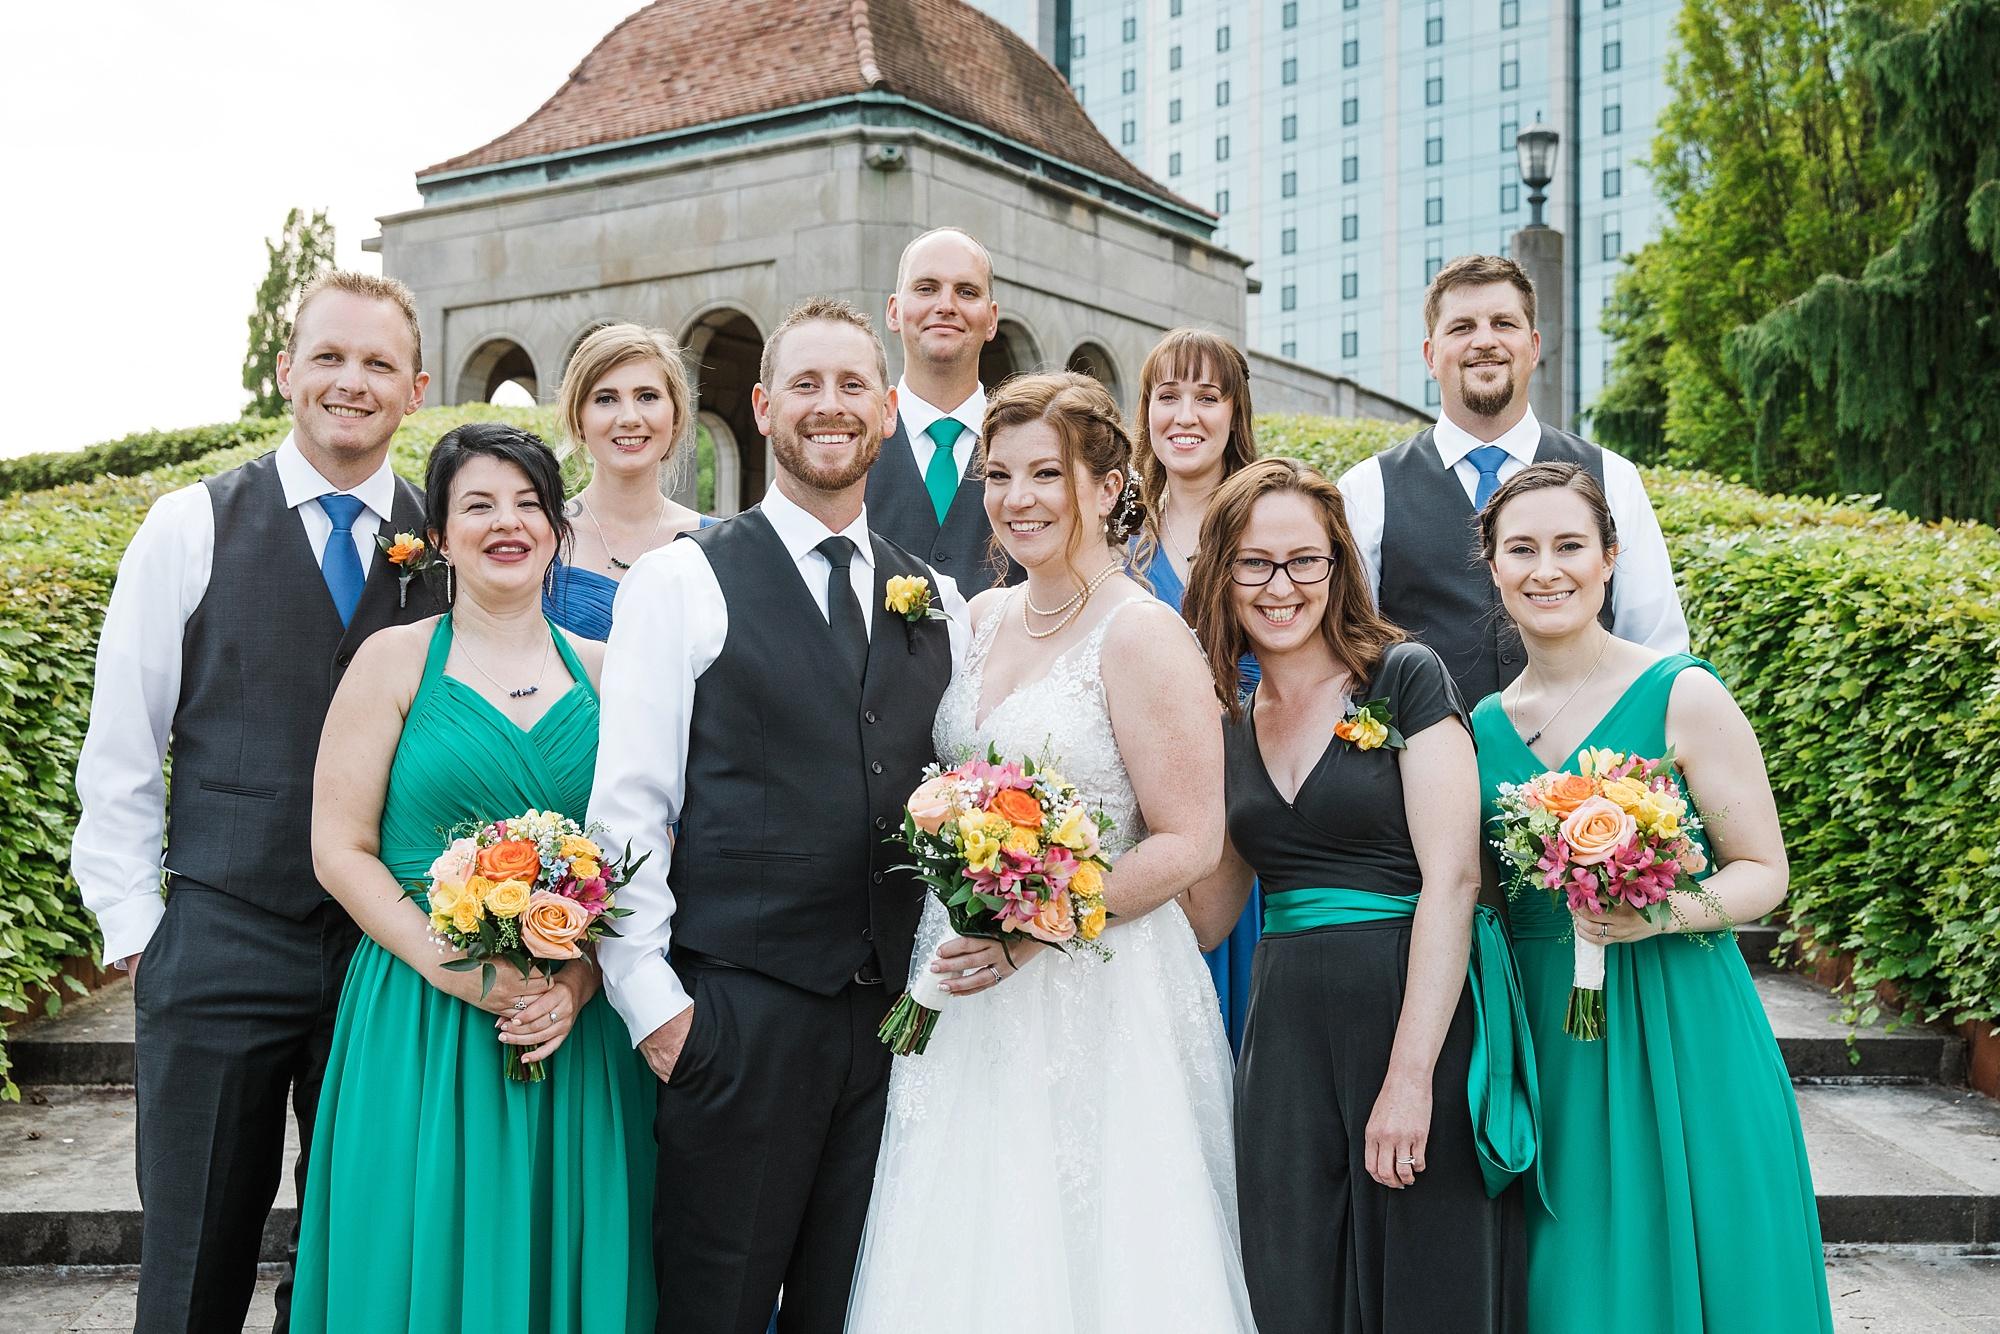 niagarafalls-weddingphotography_0046.jpg